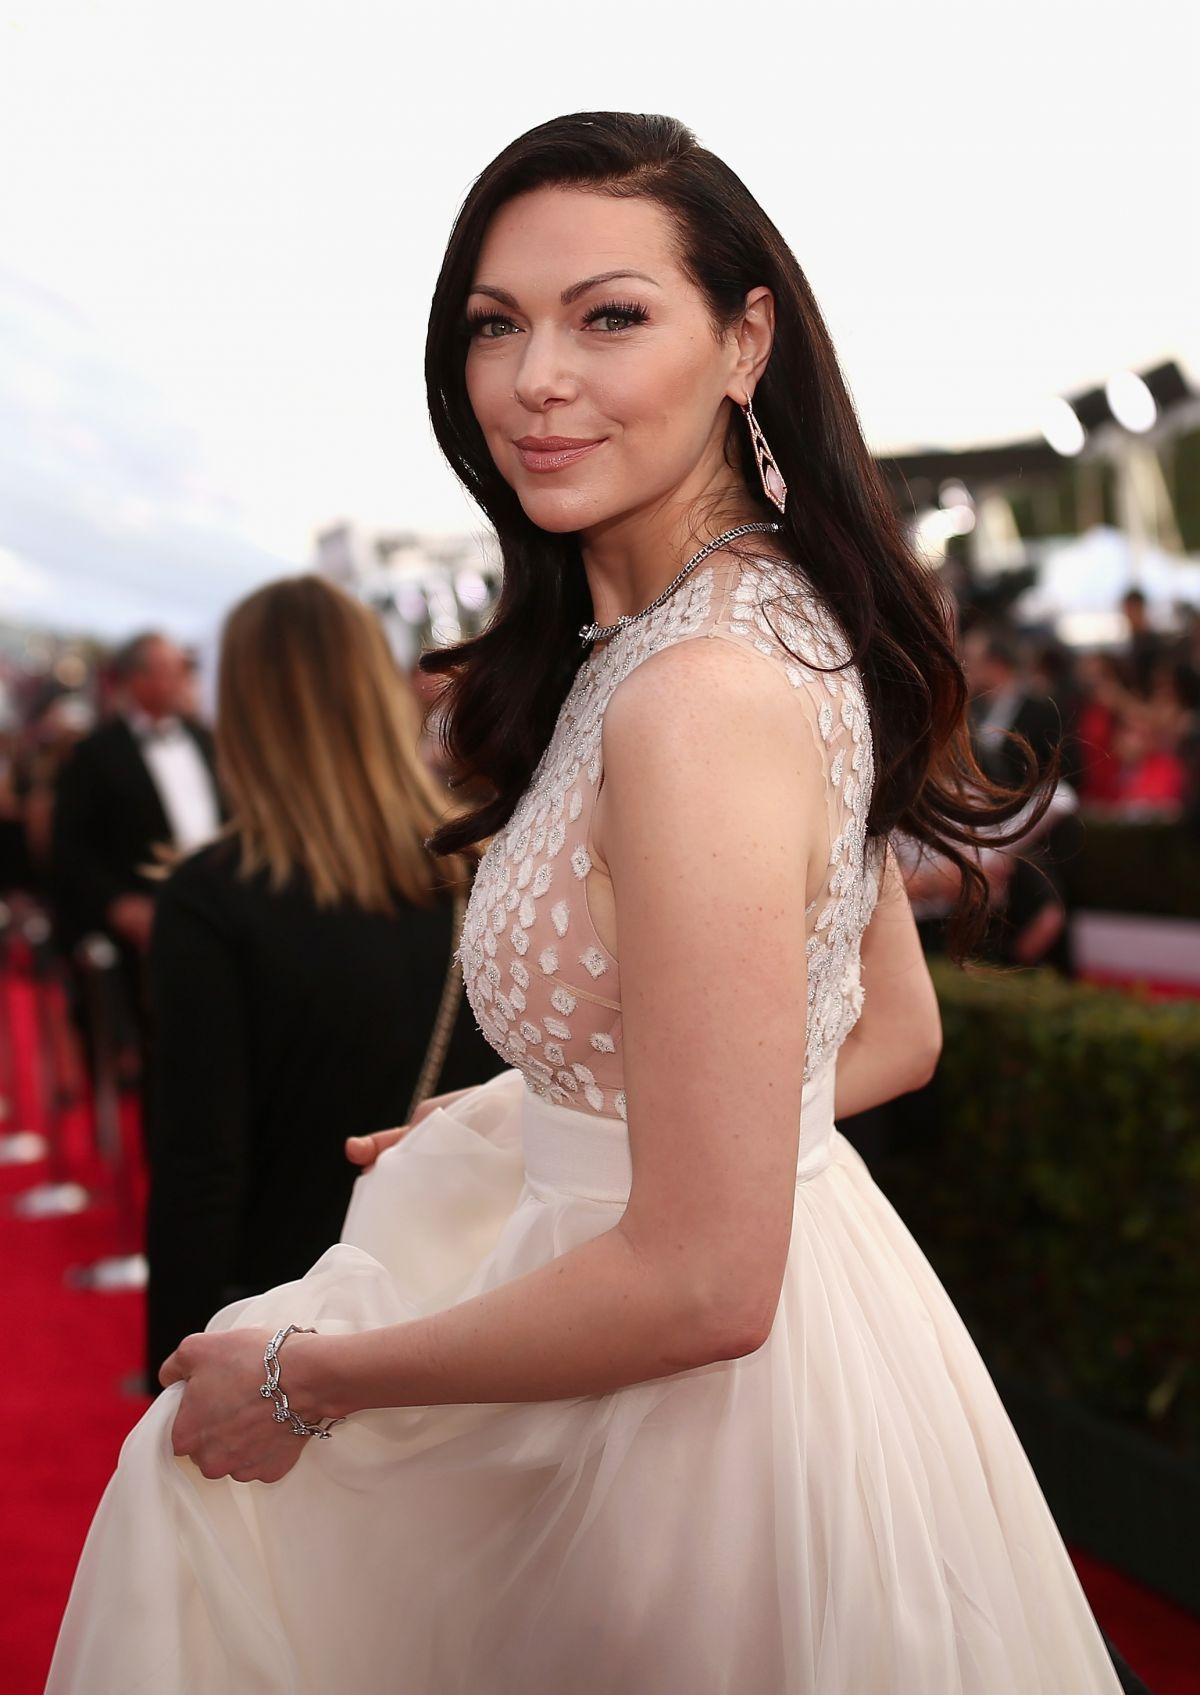 LAURA PREPON at Screen Actors Guild Awards 2016 in Los Angeles 01302016  HawtCelebs